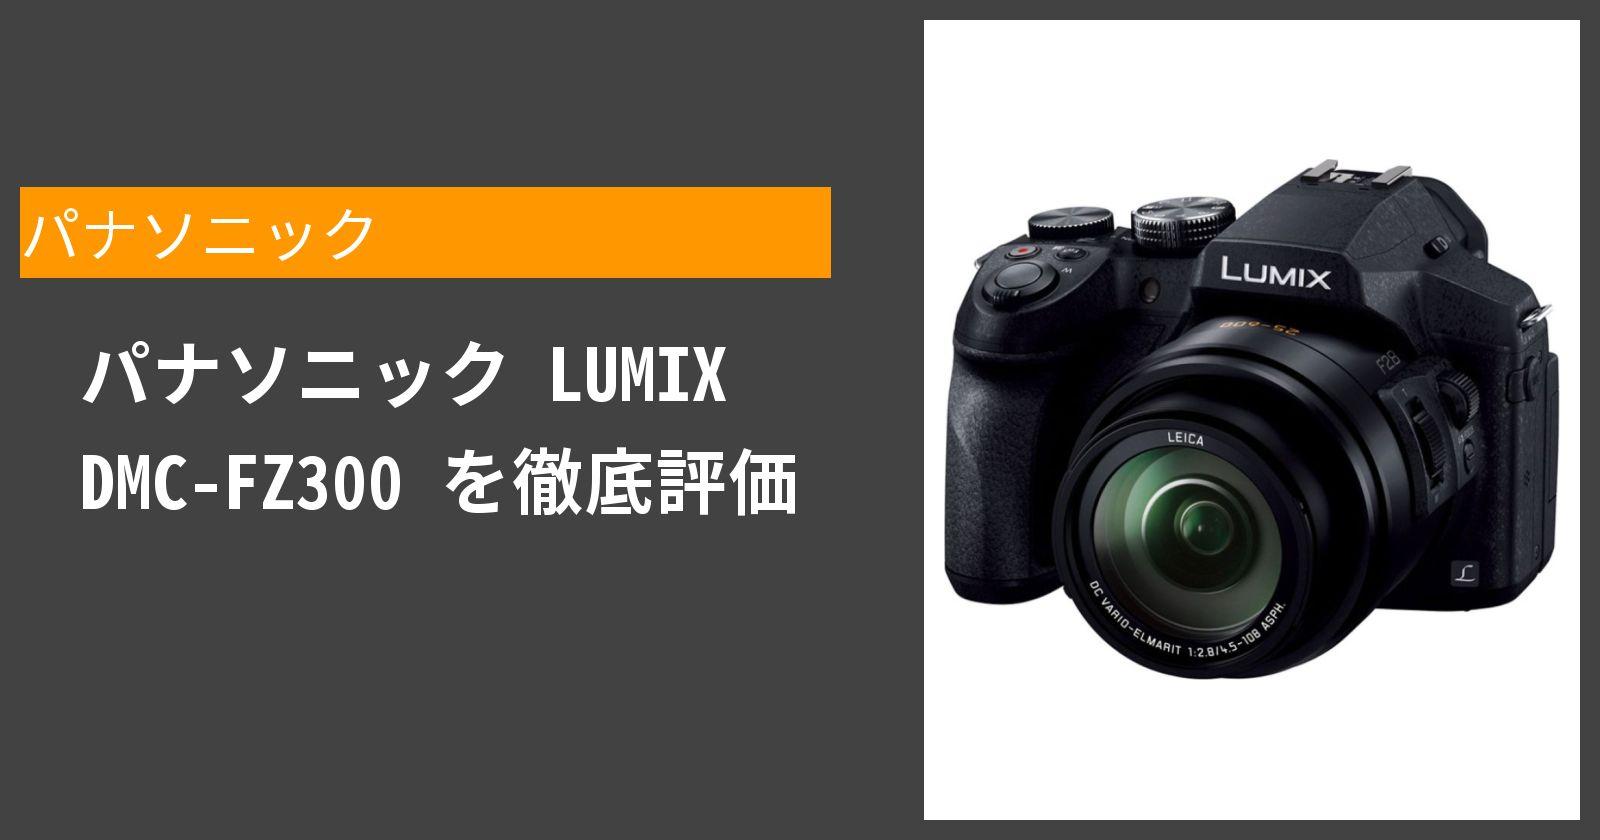 LUMIX DMC-FZ300を徹底評価